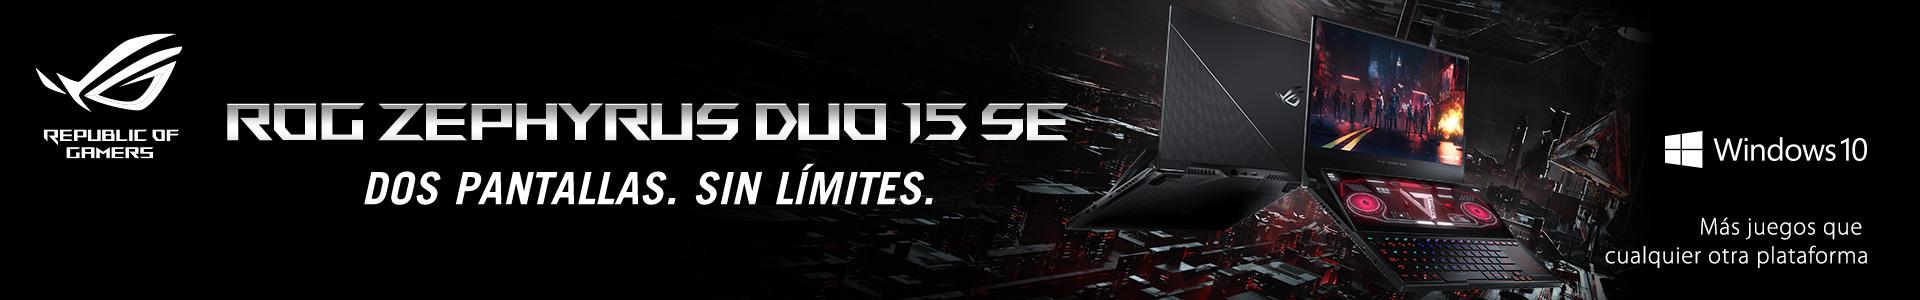 Portátiles Asus Gaming